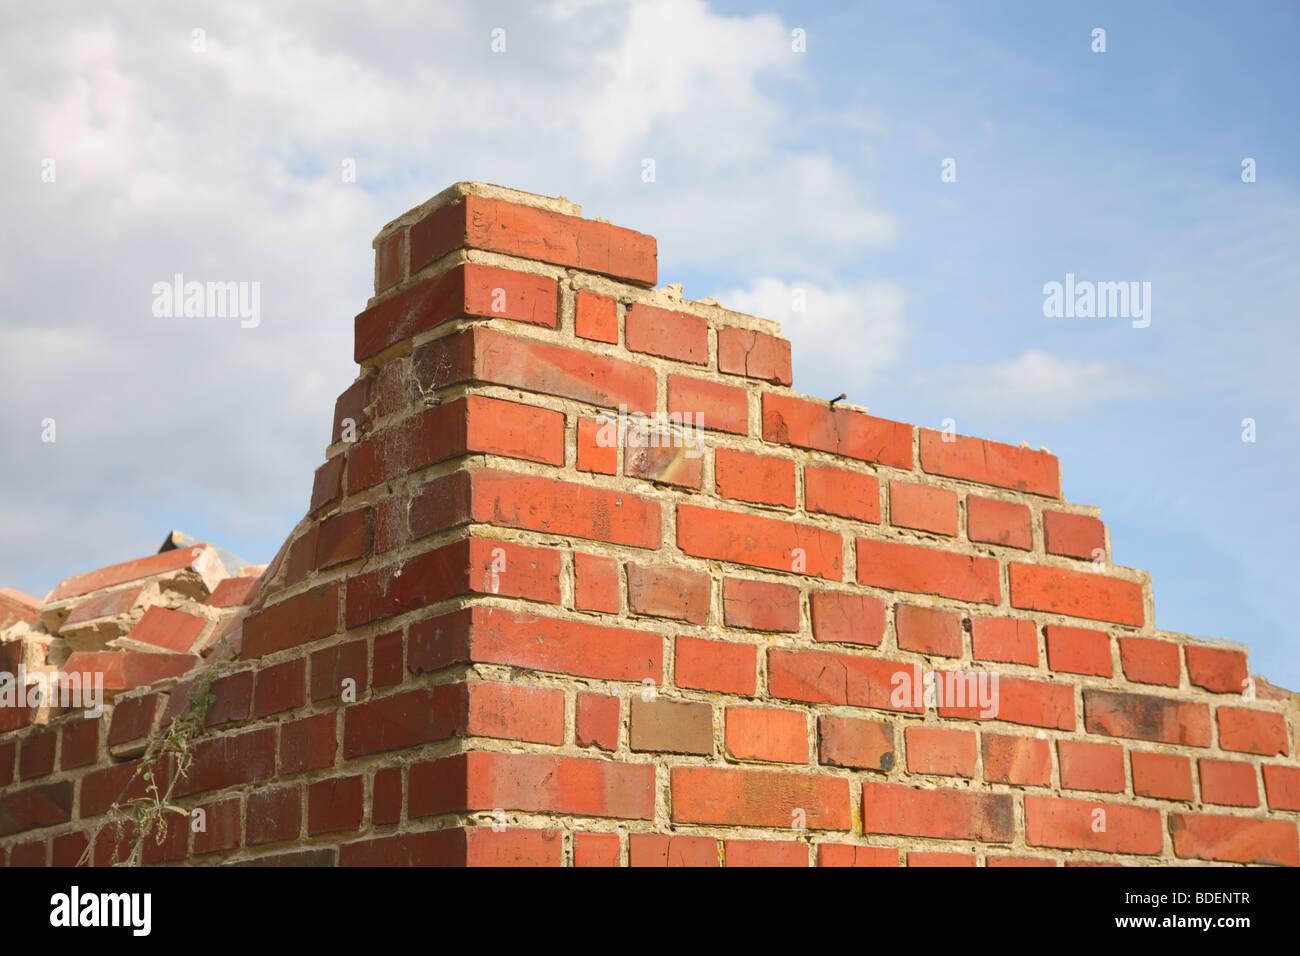 Demolition of a red brick house with one corner of broken bricks left. - Stock Image